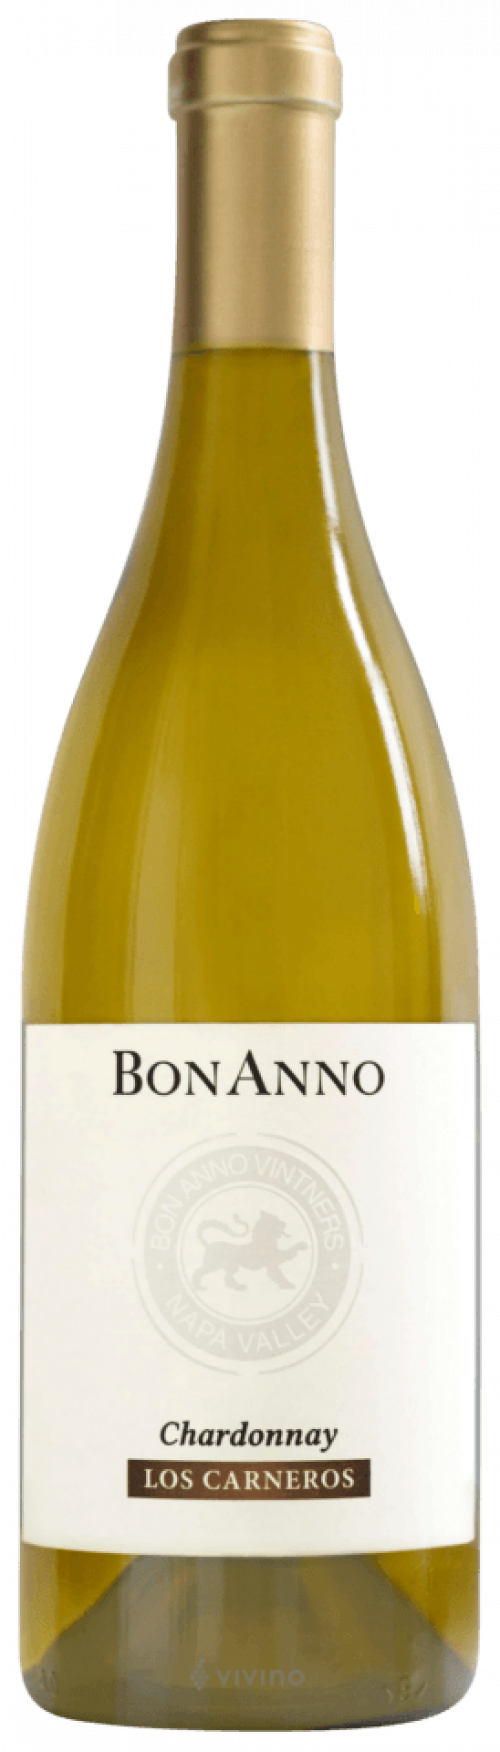 Bon Anno Chardonnay 750ml